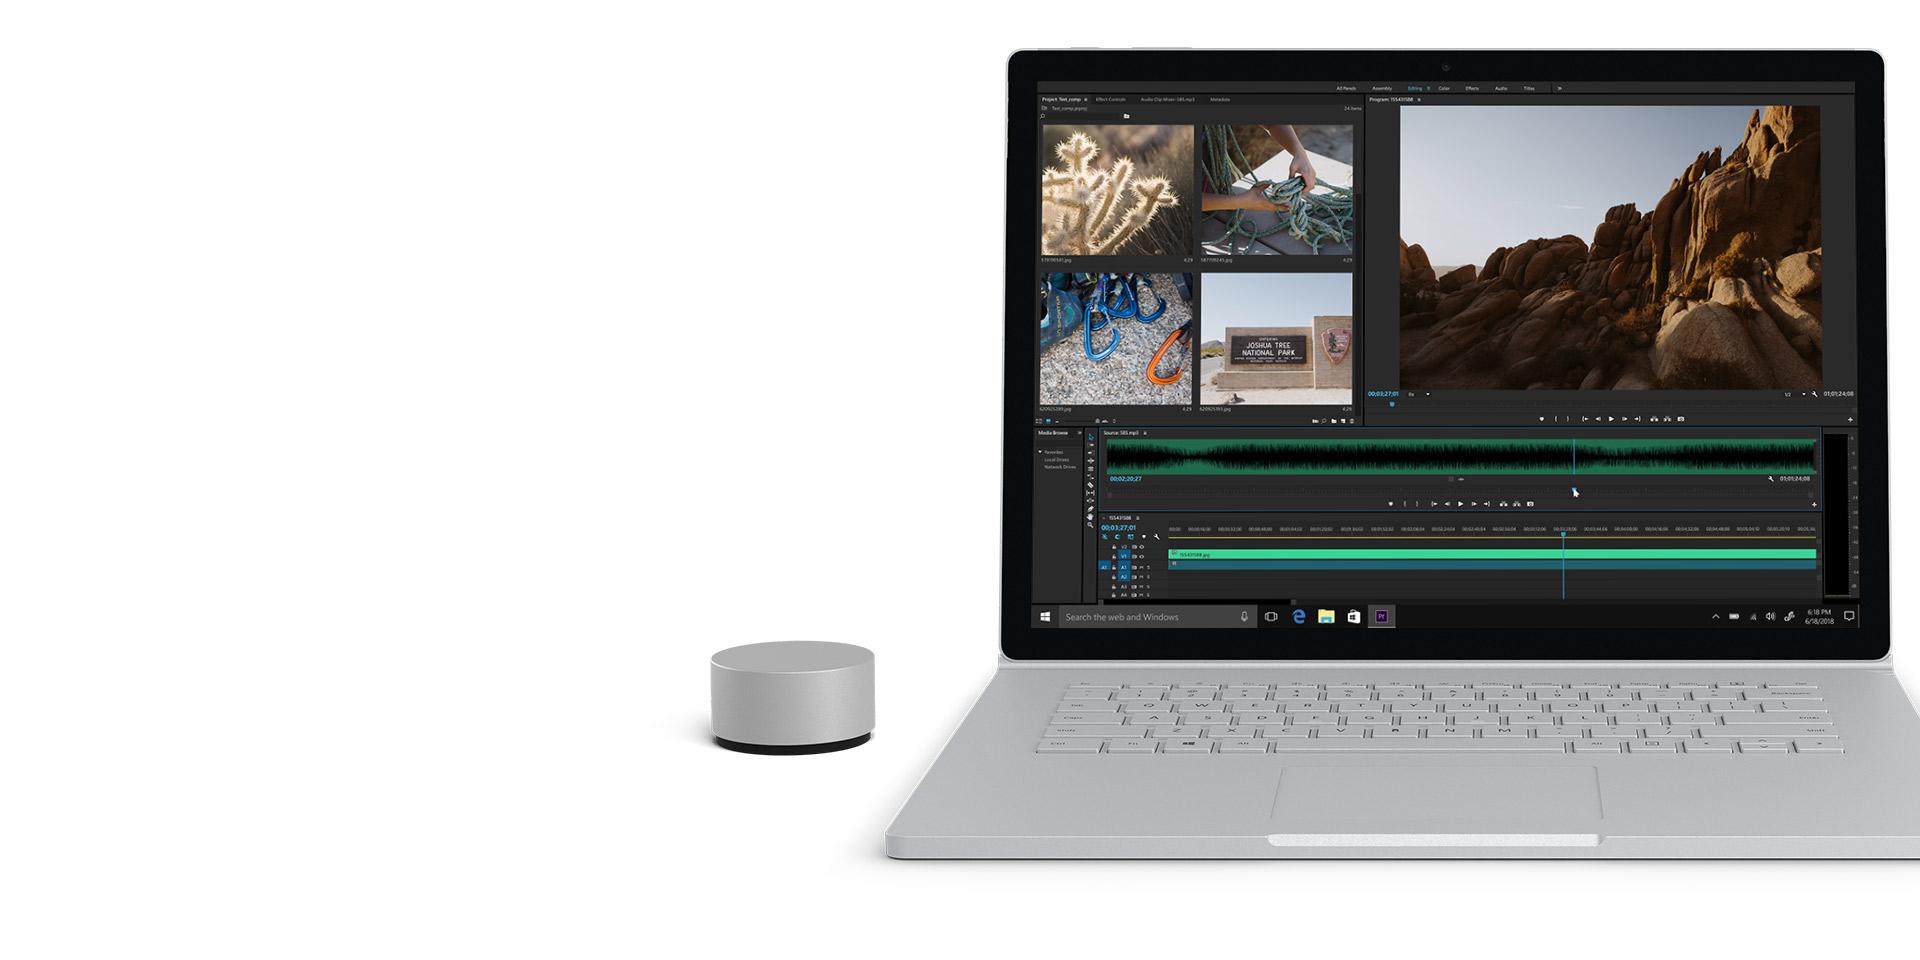 Adobe Premiere Pro Surface Book 2 -näytössä